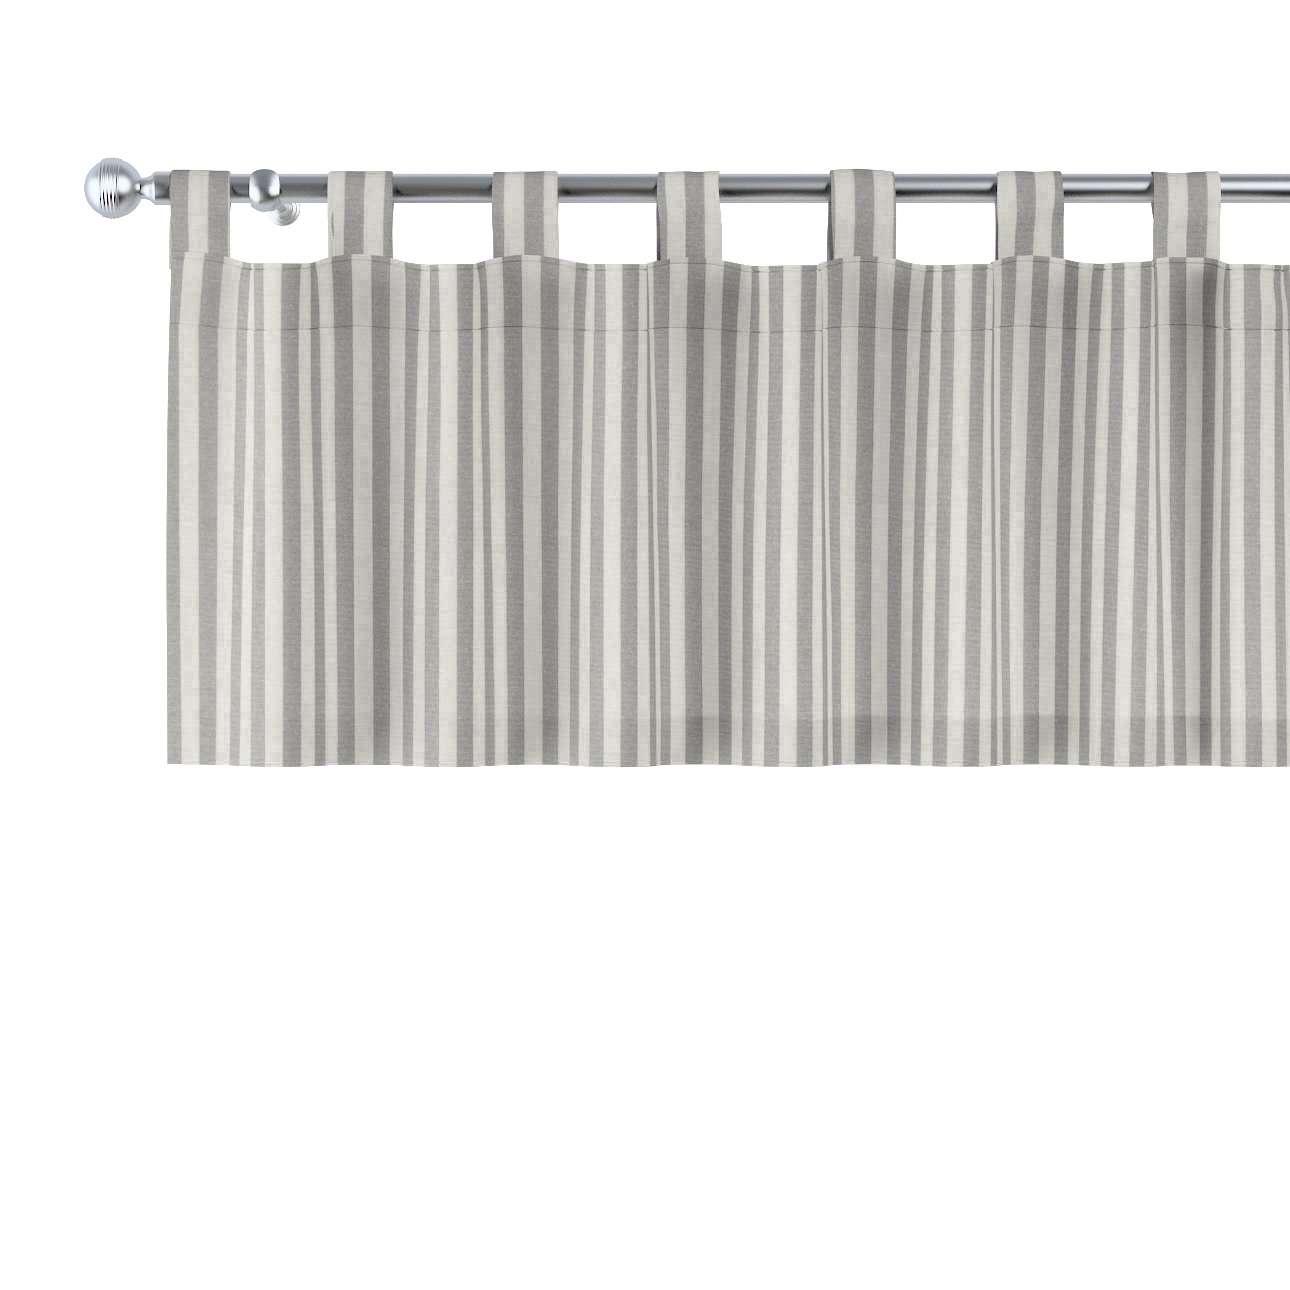 Lambrekin na szelkach 130x40cm w kolekcji Quadro, tkanina: 136-12